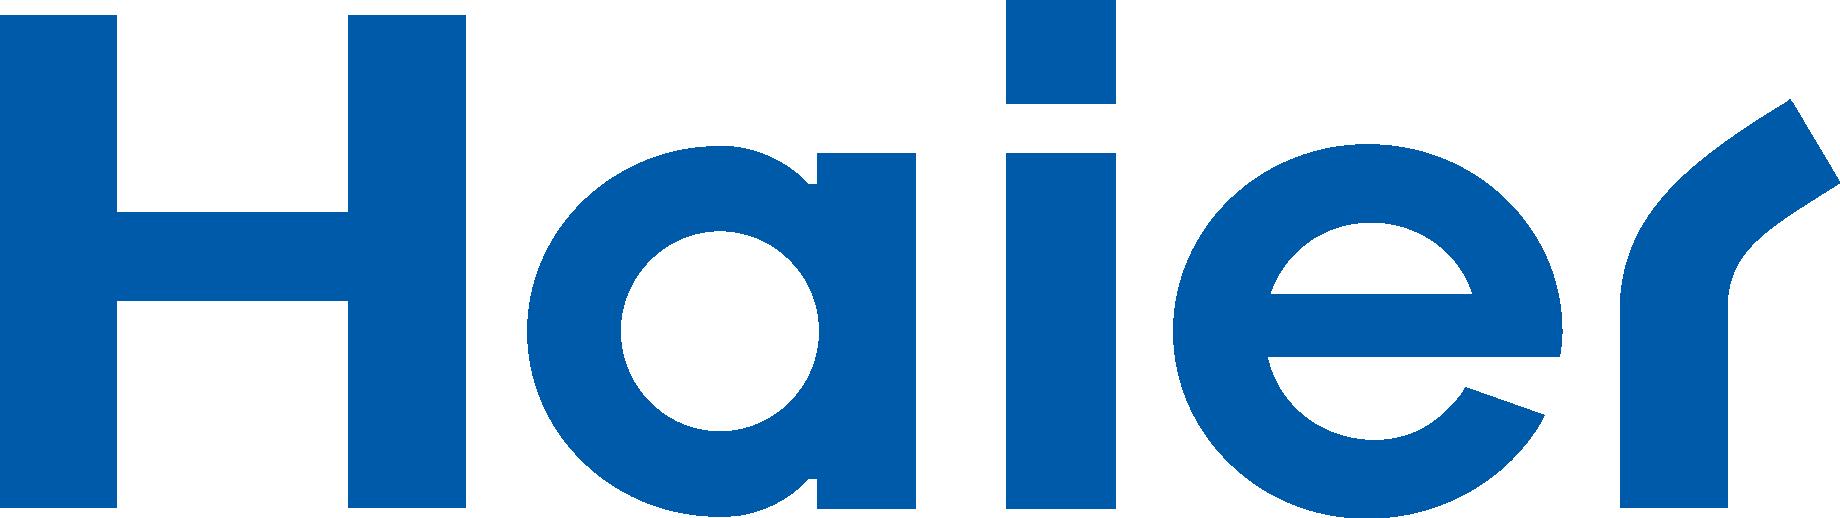 Haier Logo png